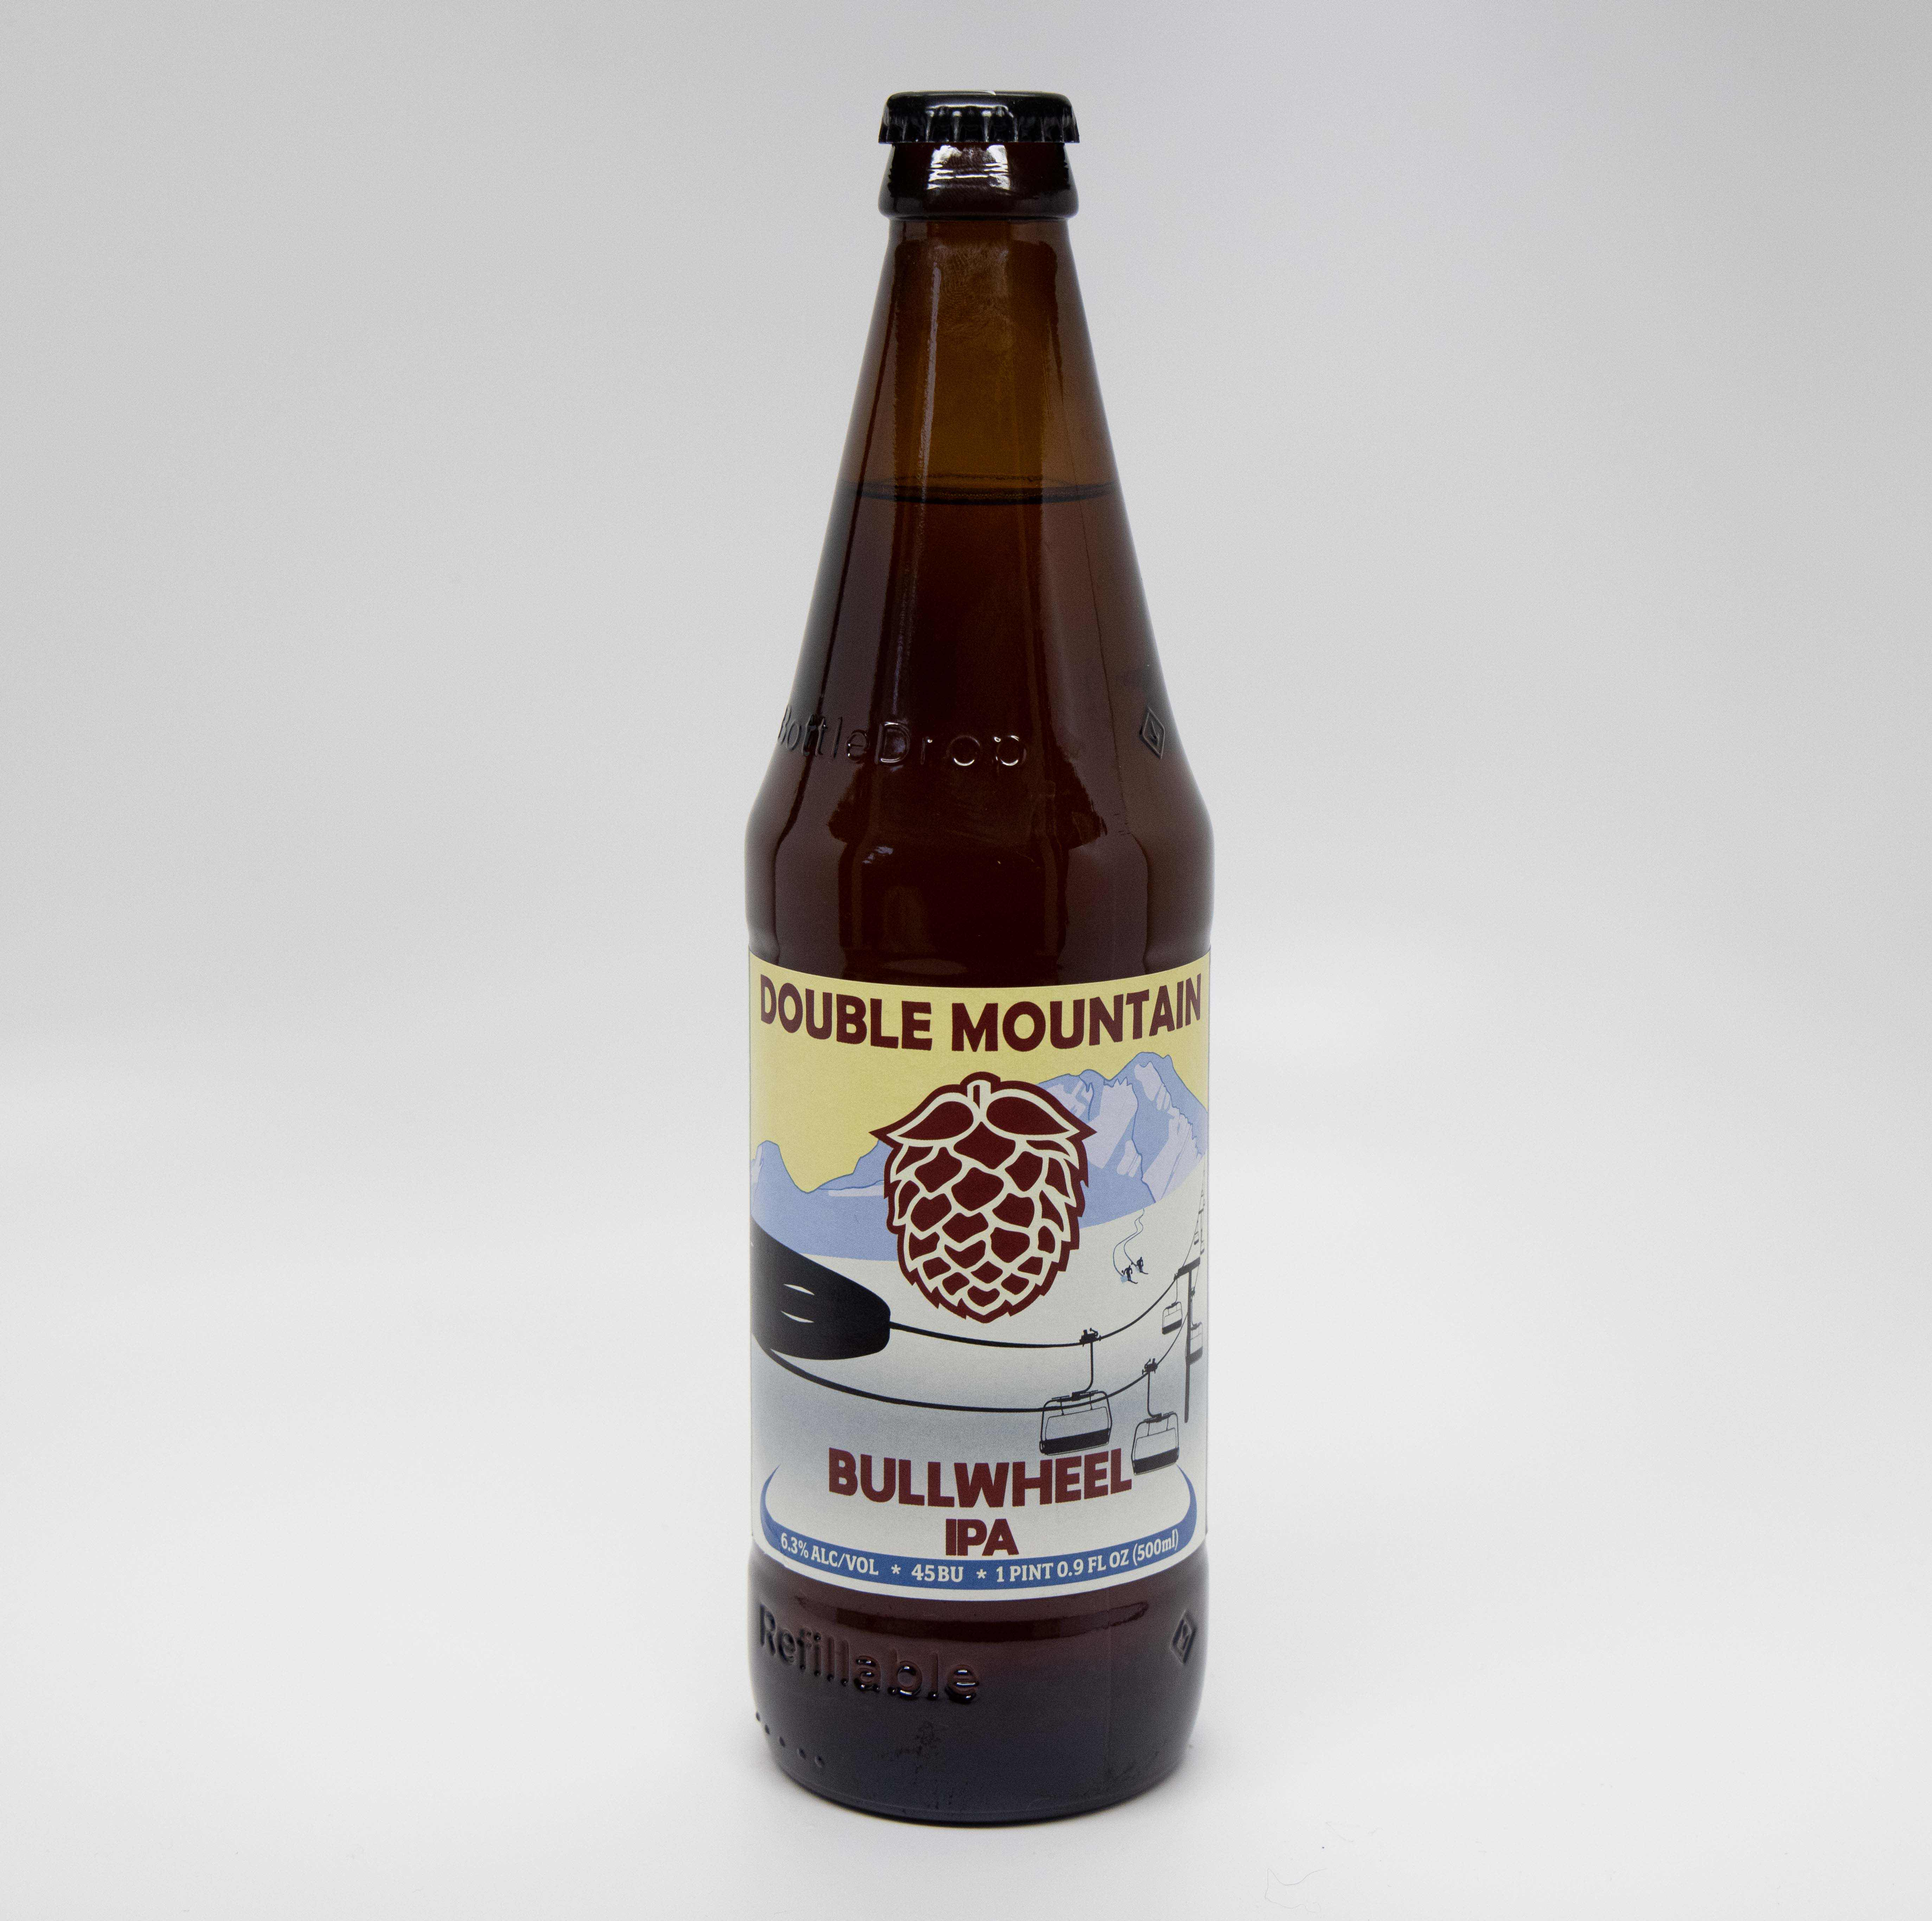 Double Mountain Bullwheel IPA